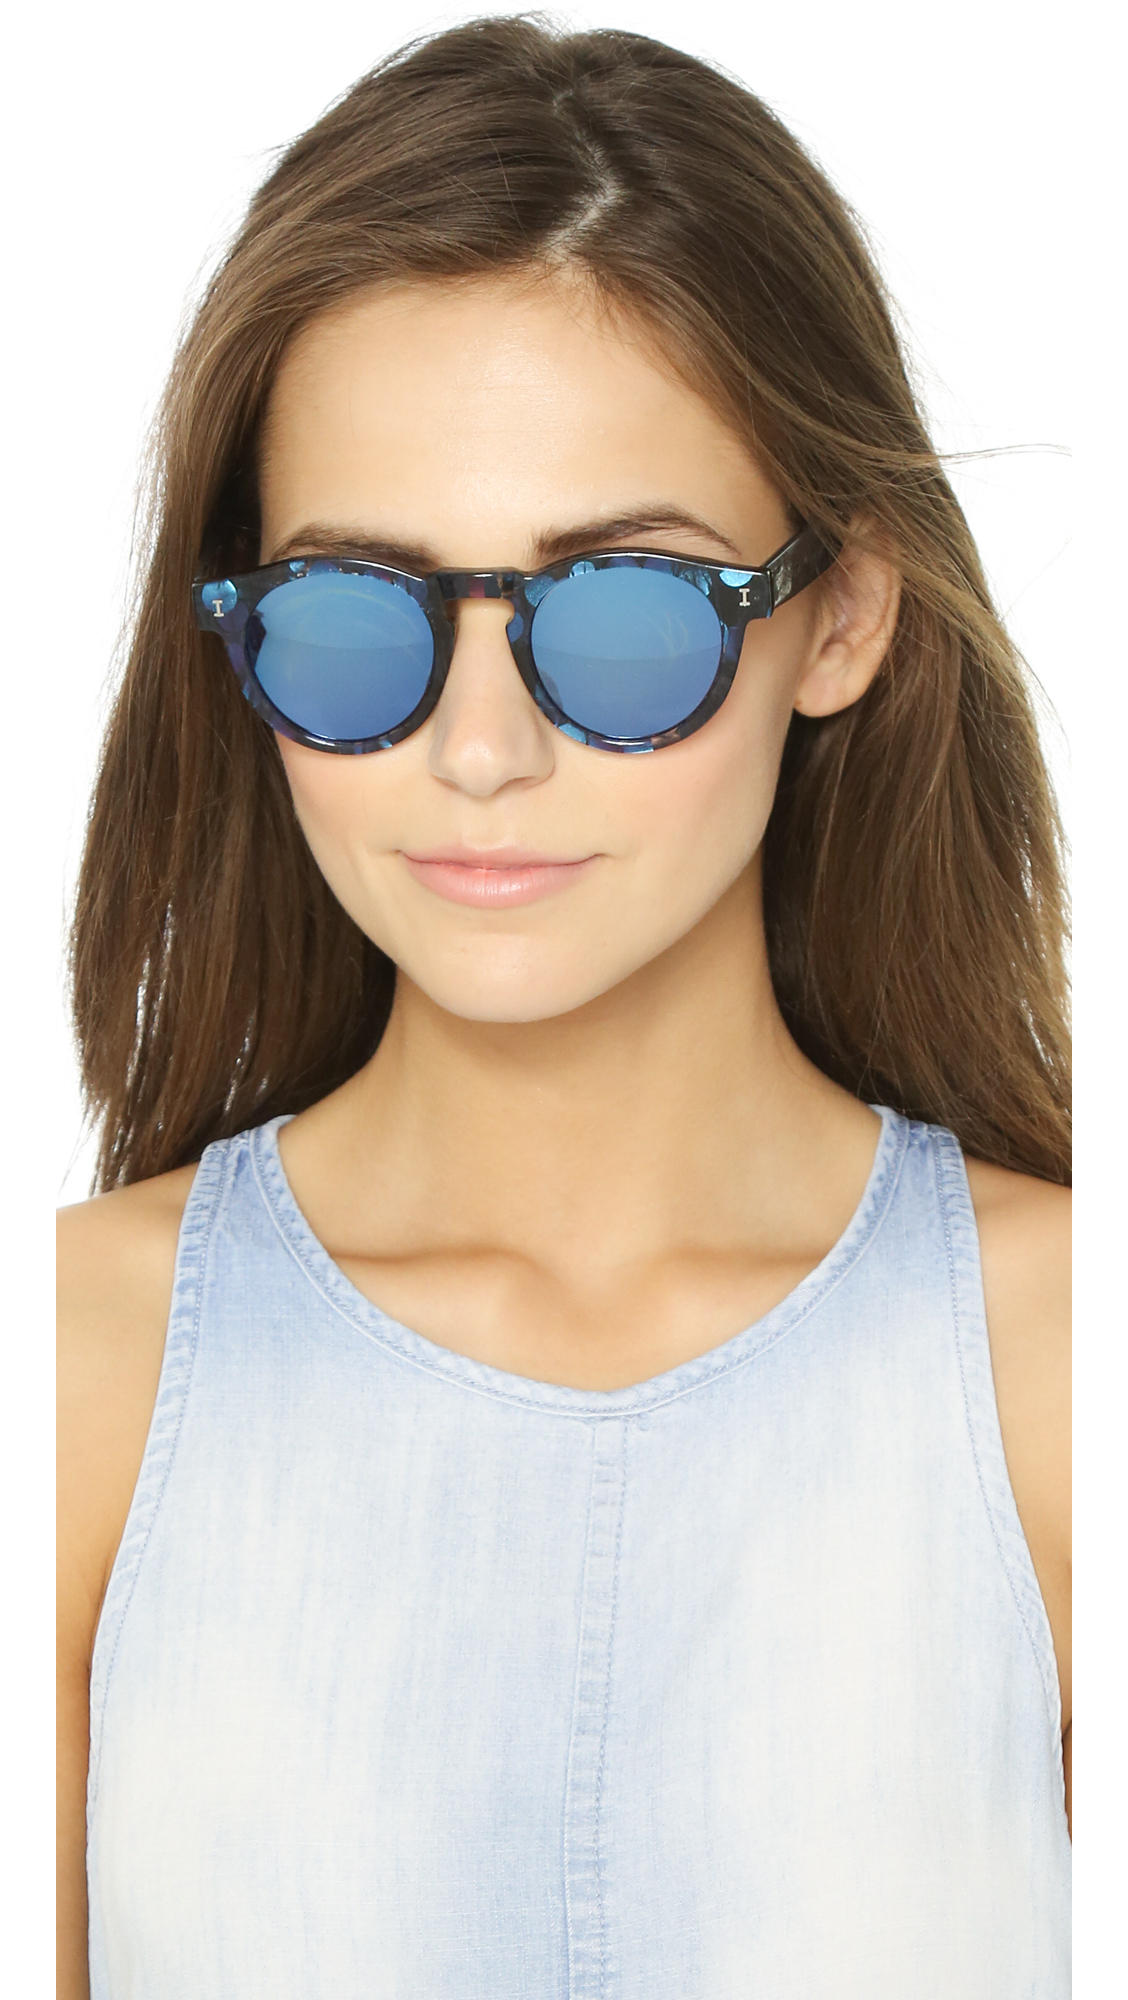 41d527c07 Illesteva Leonard Mirrored Sunglasses - Eco Blueberry/blue in Blue ...